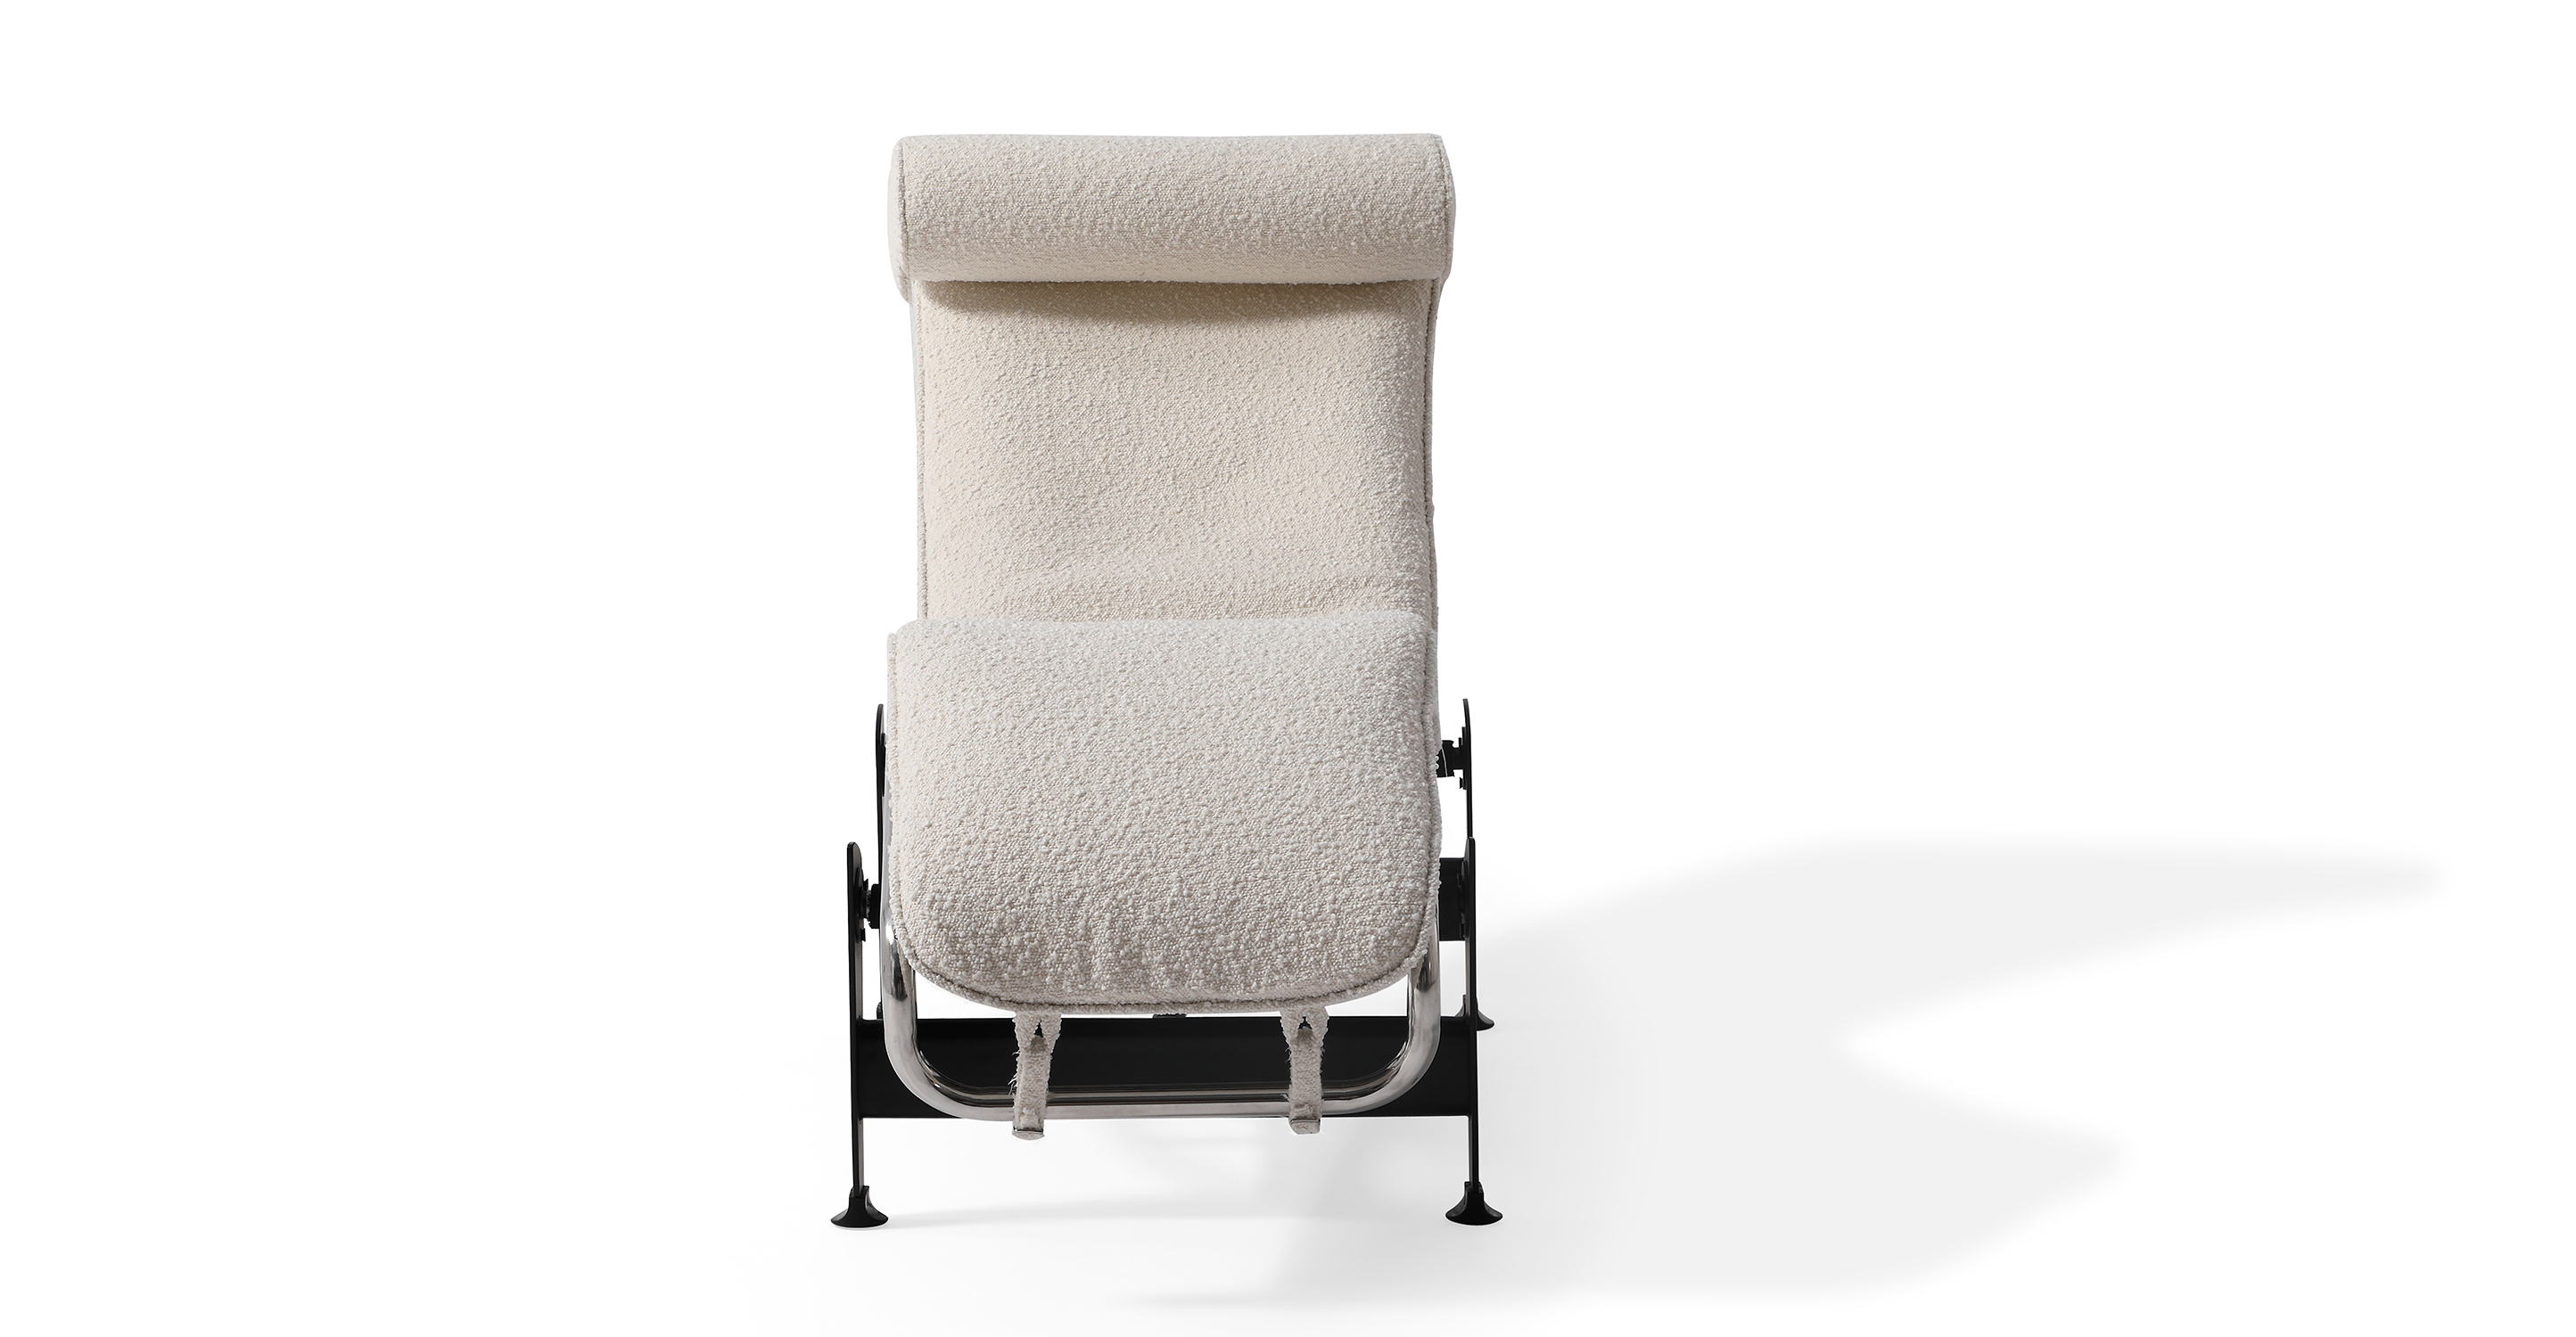 Gravity Chaise Lounge, Blanc Boucle